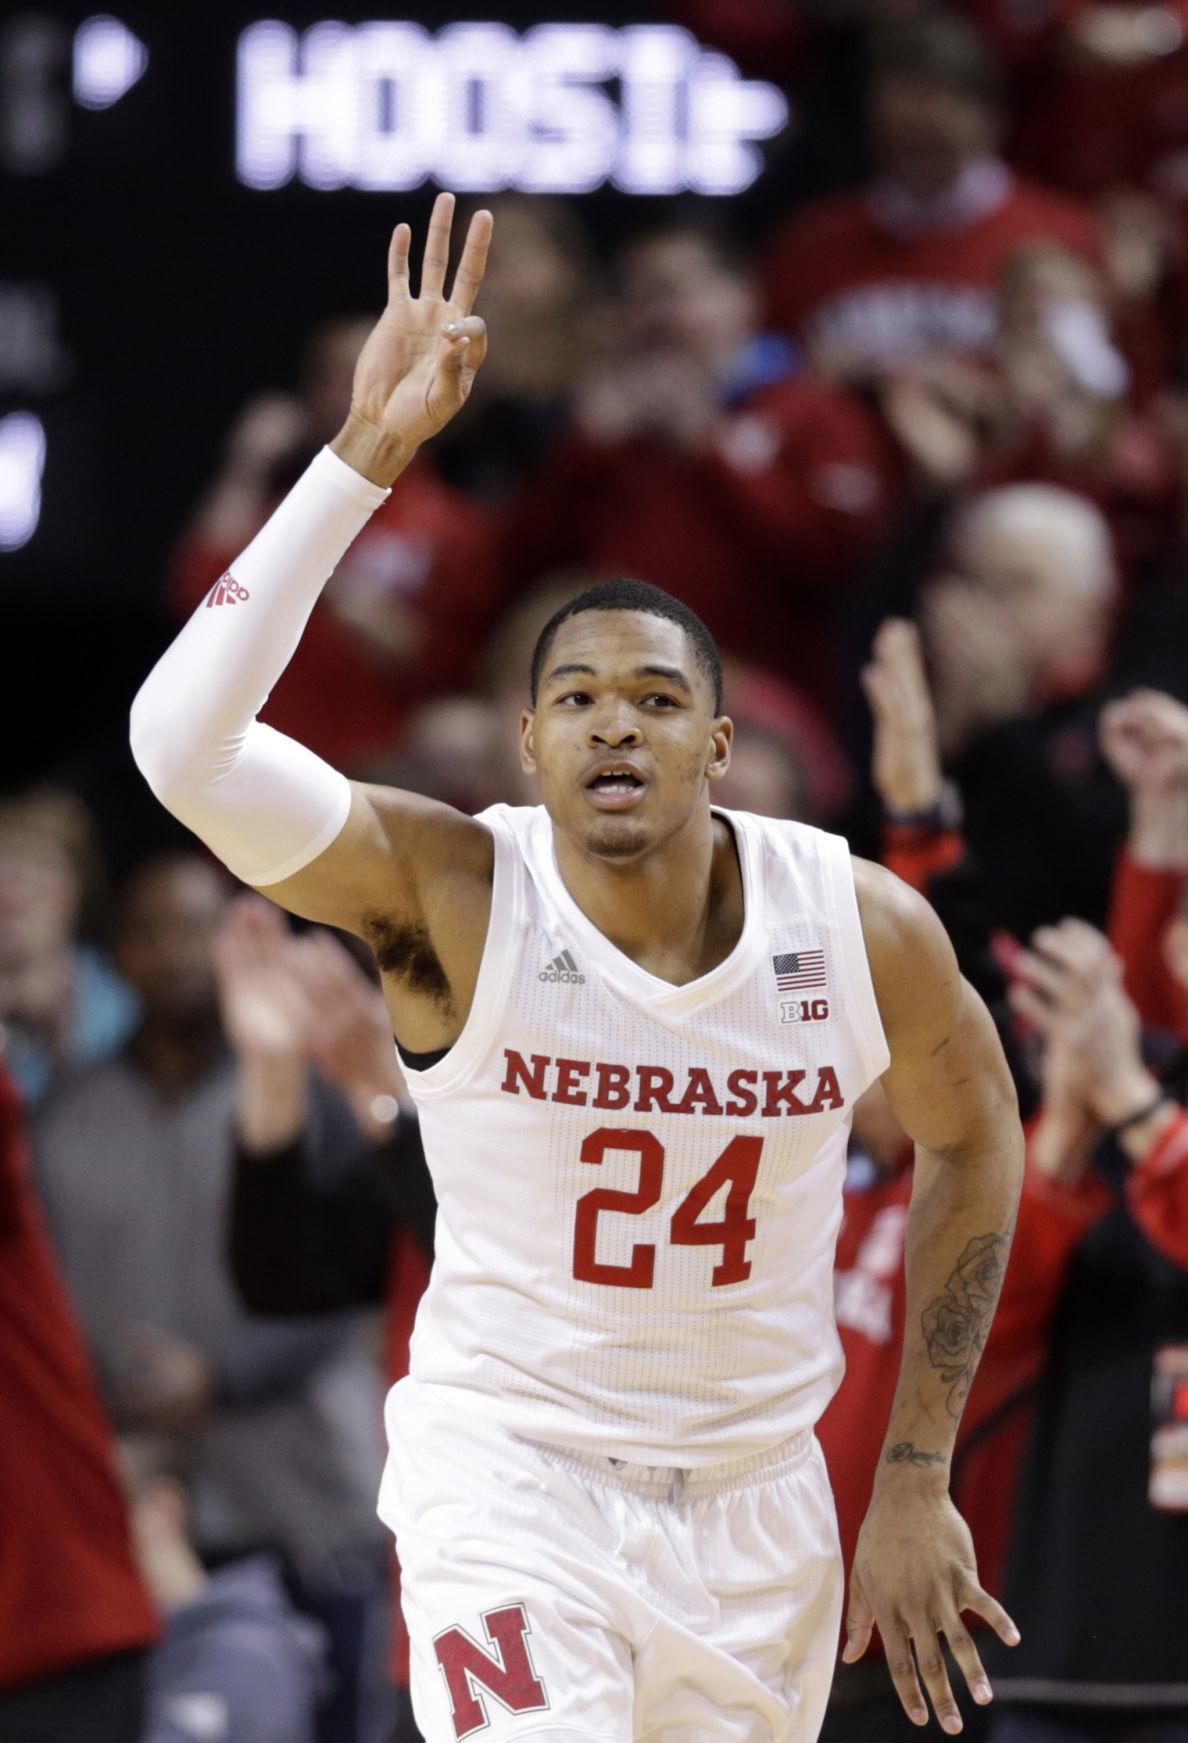 Indiana Nebraska Basketball